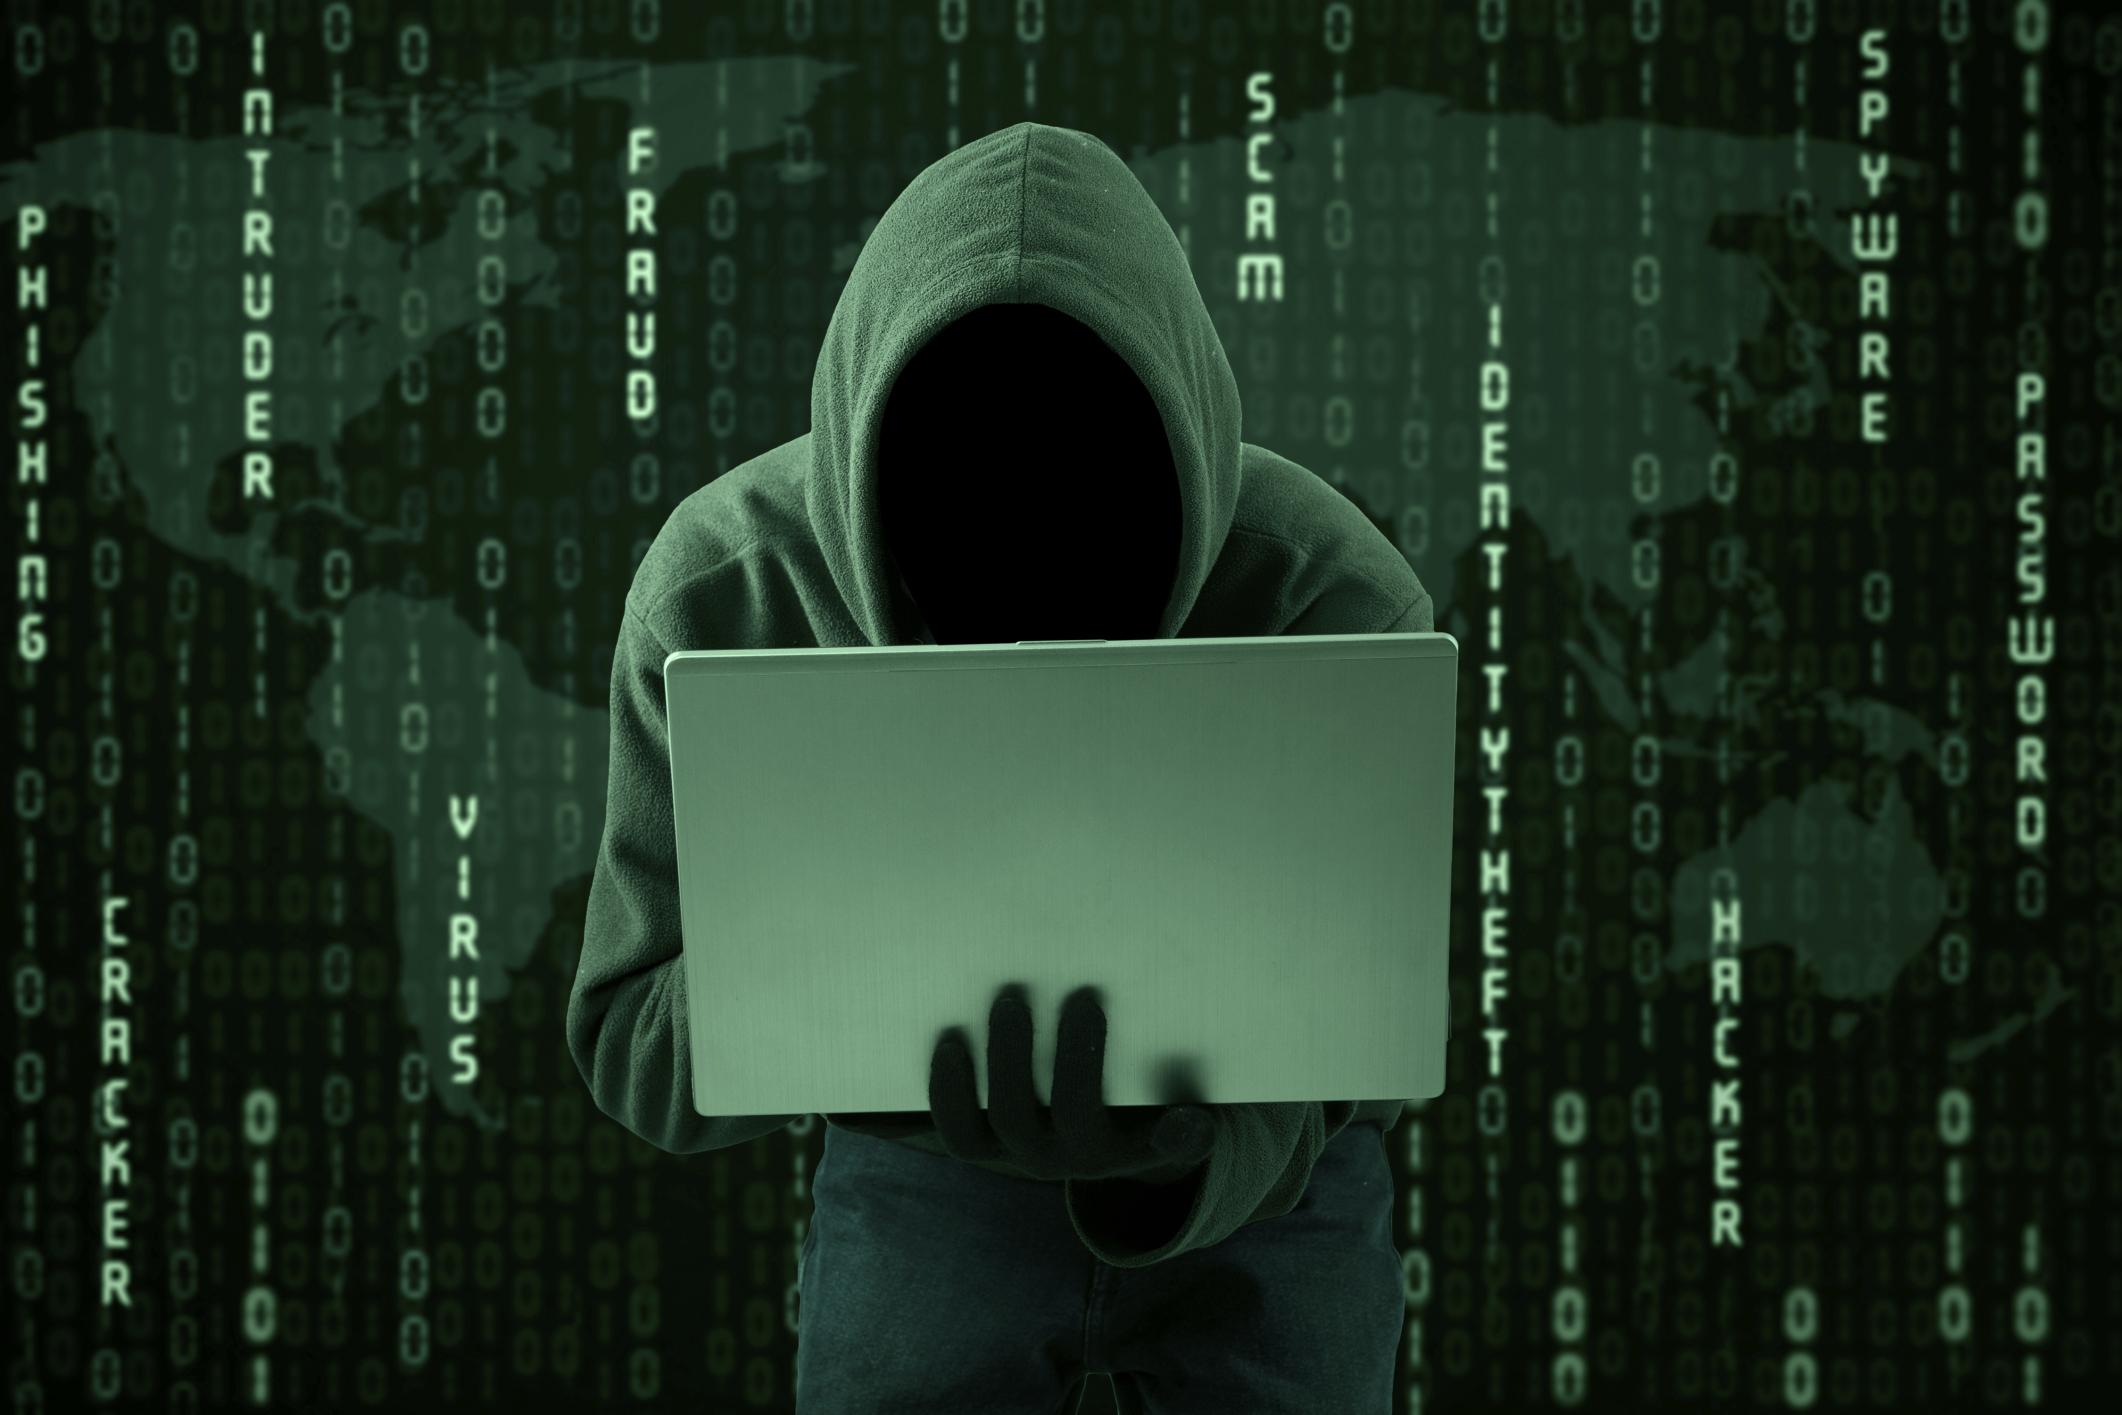 Stolen laptop leads to data breach